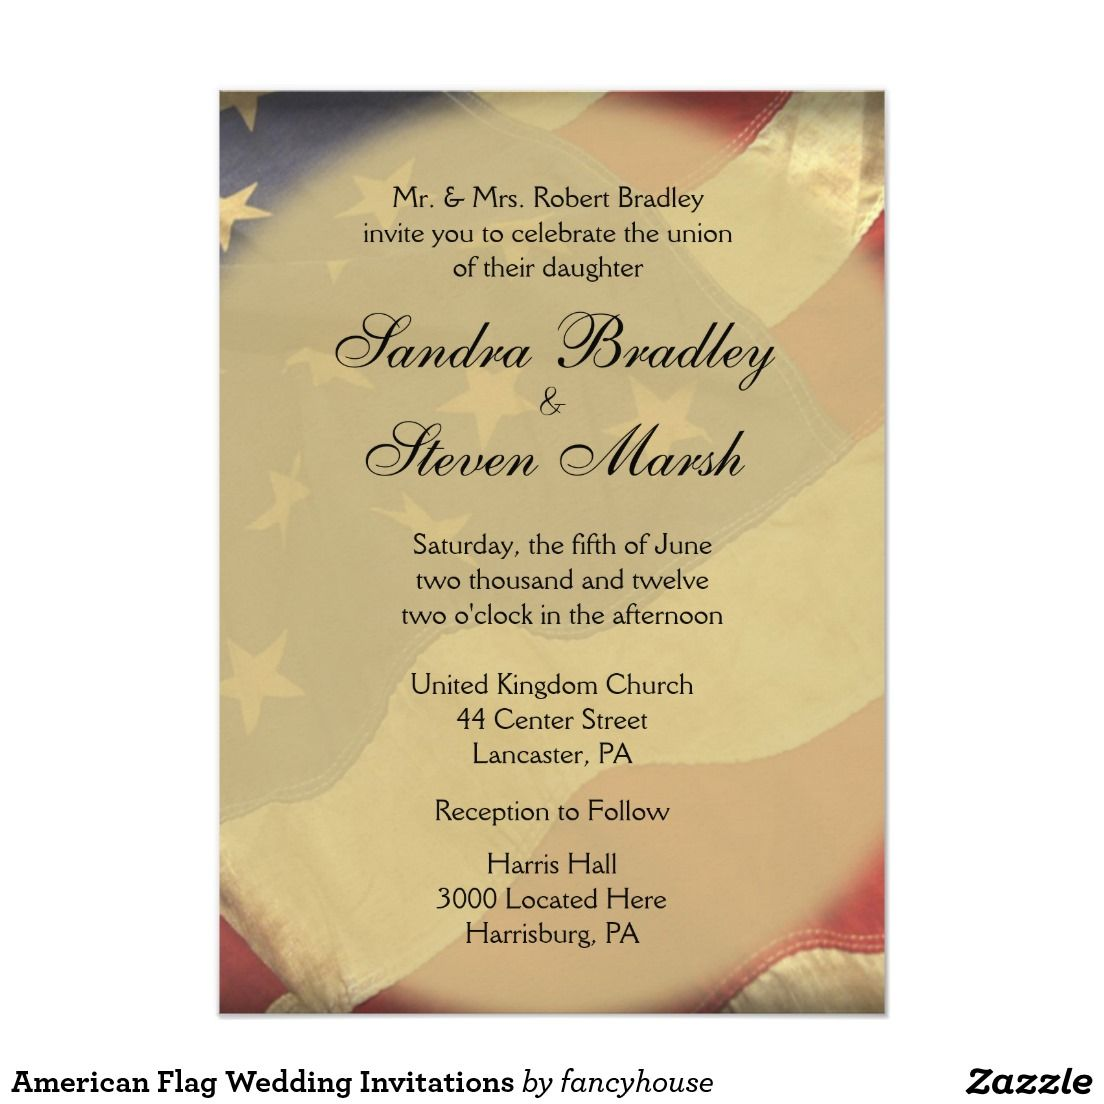 american flag wedding invitations military wedding old glory patriotic wedding military - Patriotic Wedding Invitations